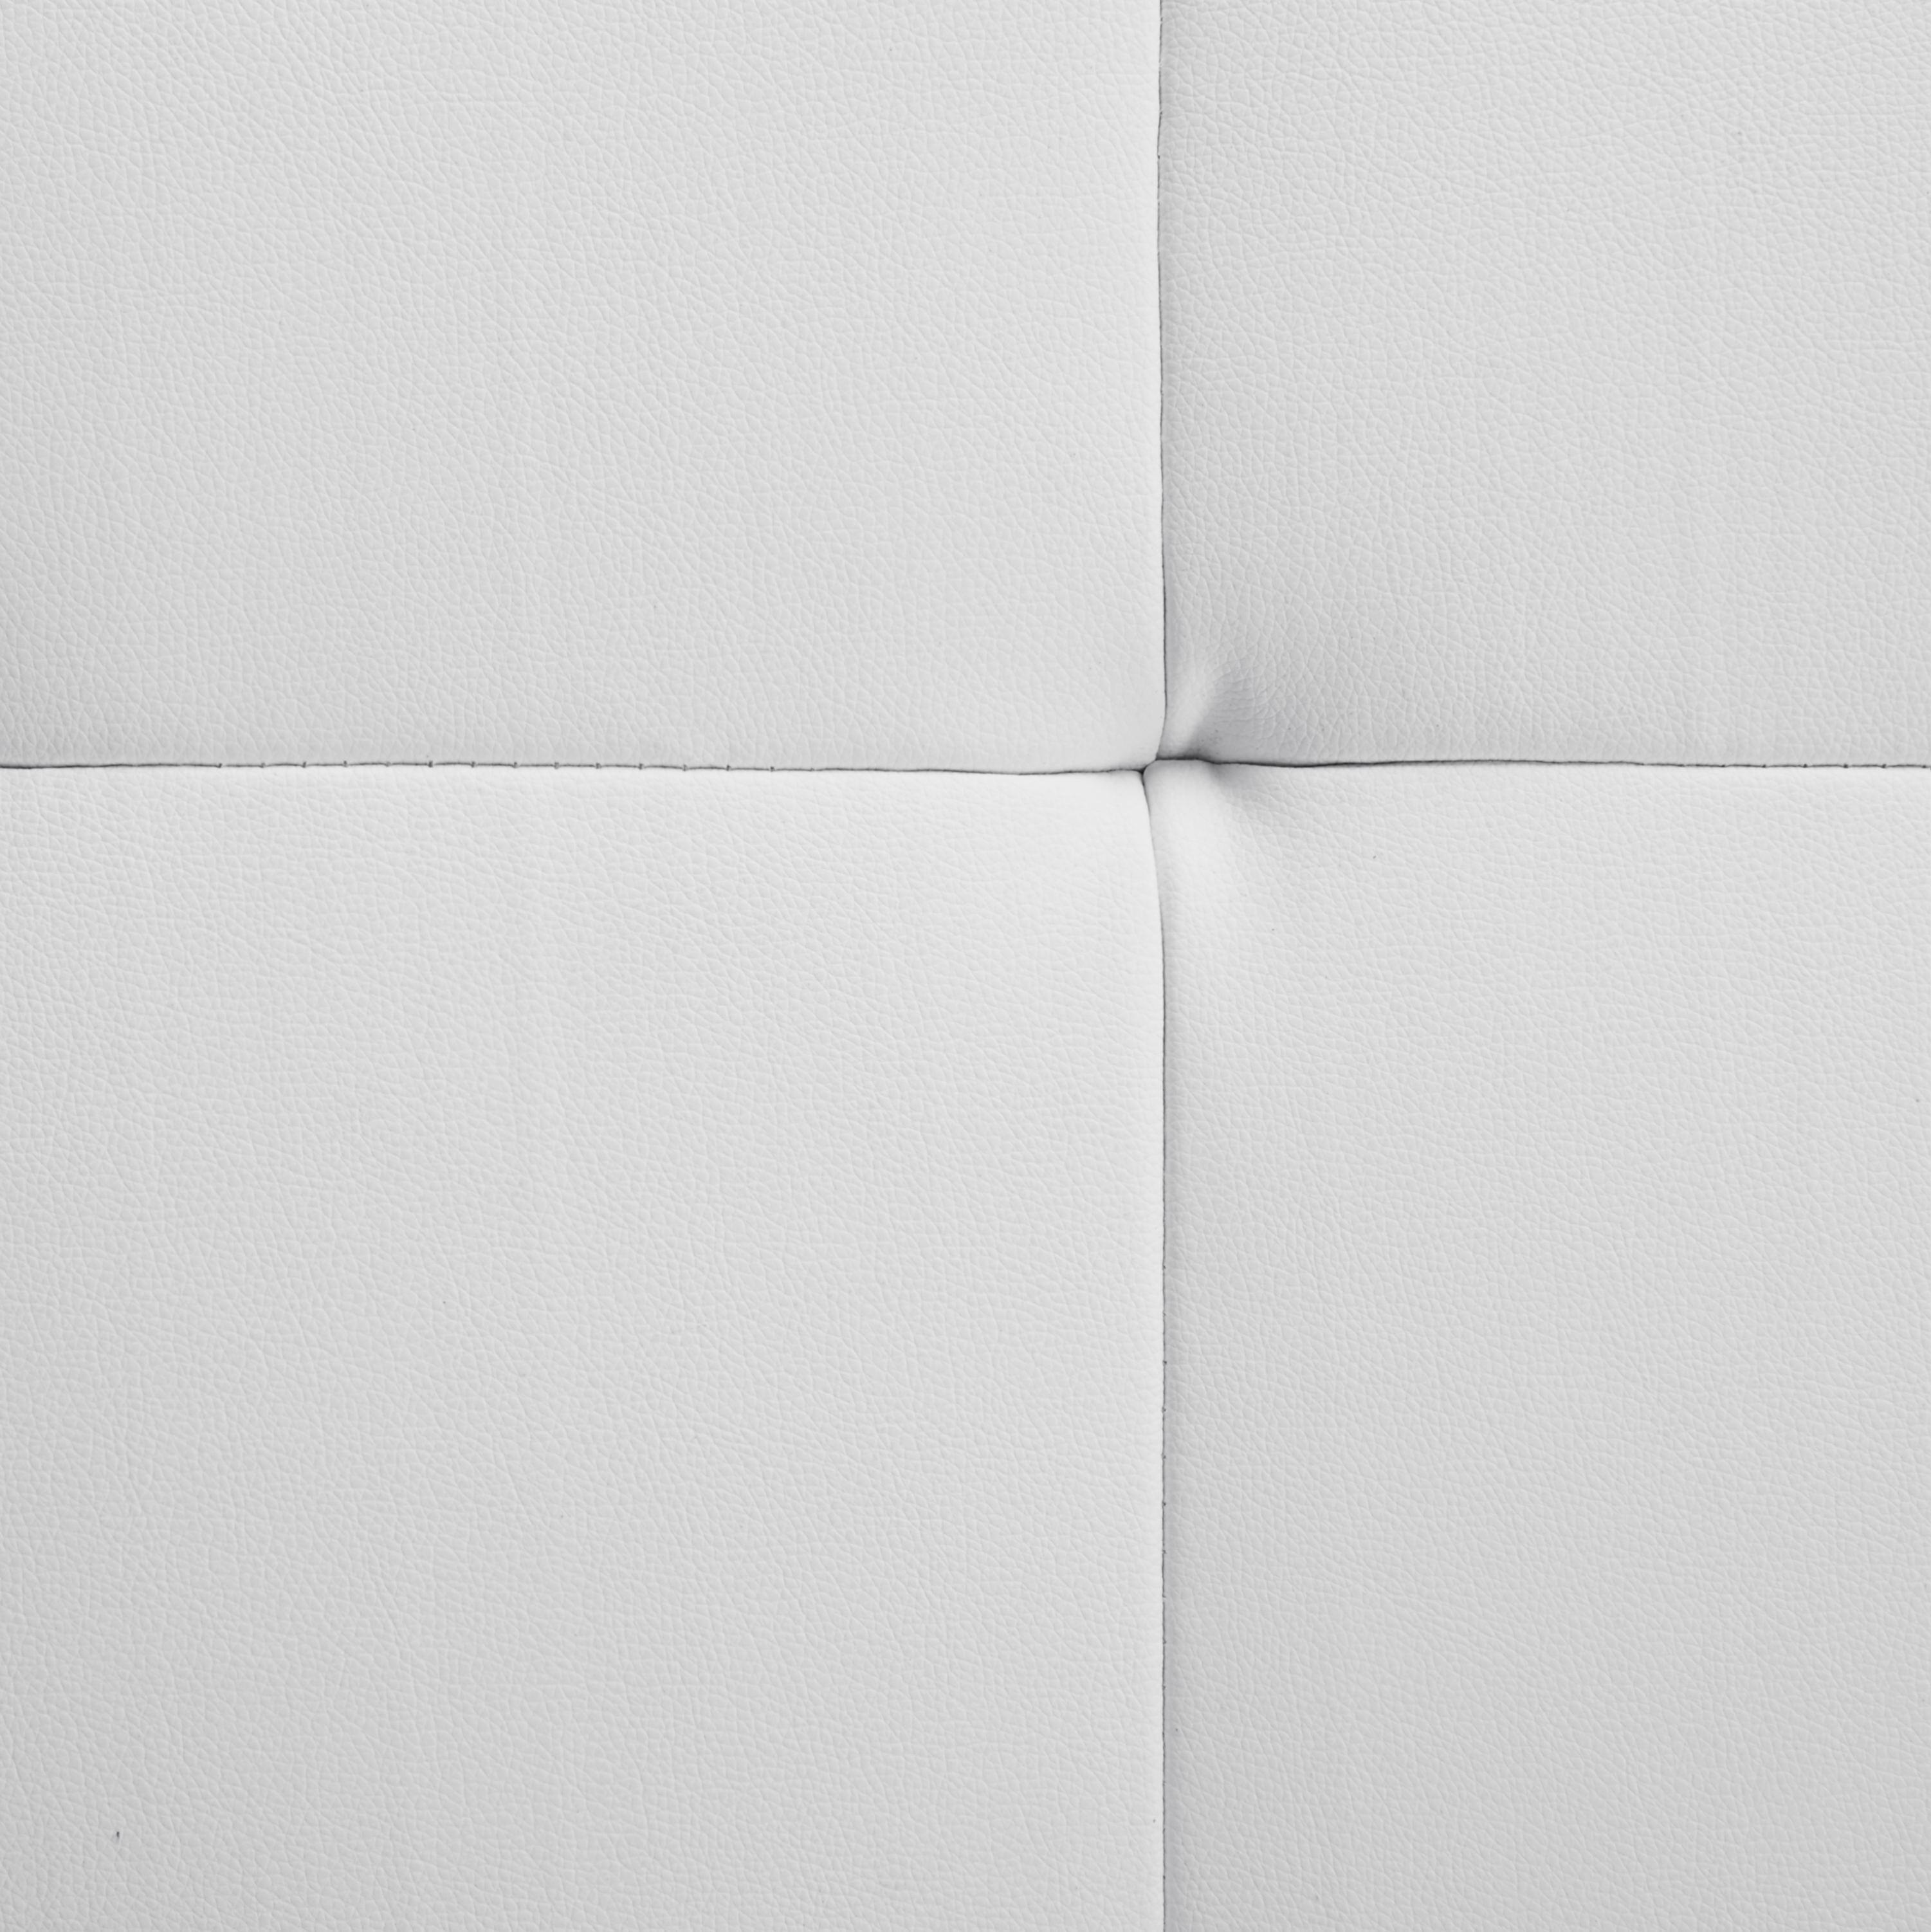 Polsterbett Lasse 180x200cm - Chromfarben/Weiß, MODERN, Holz (214/111/225cm) - MÖMAX modern living